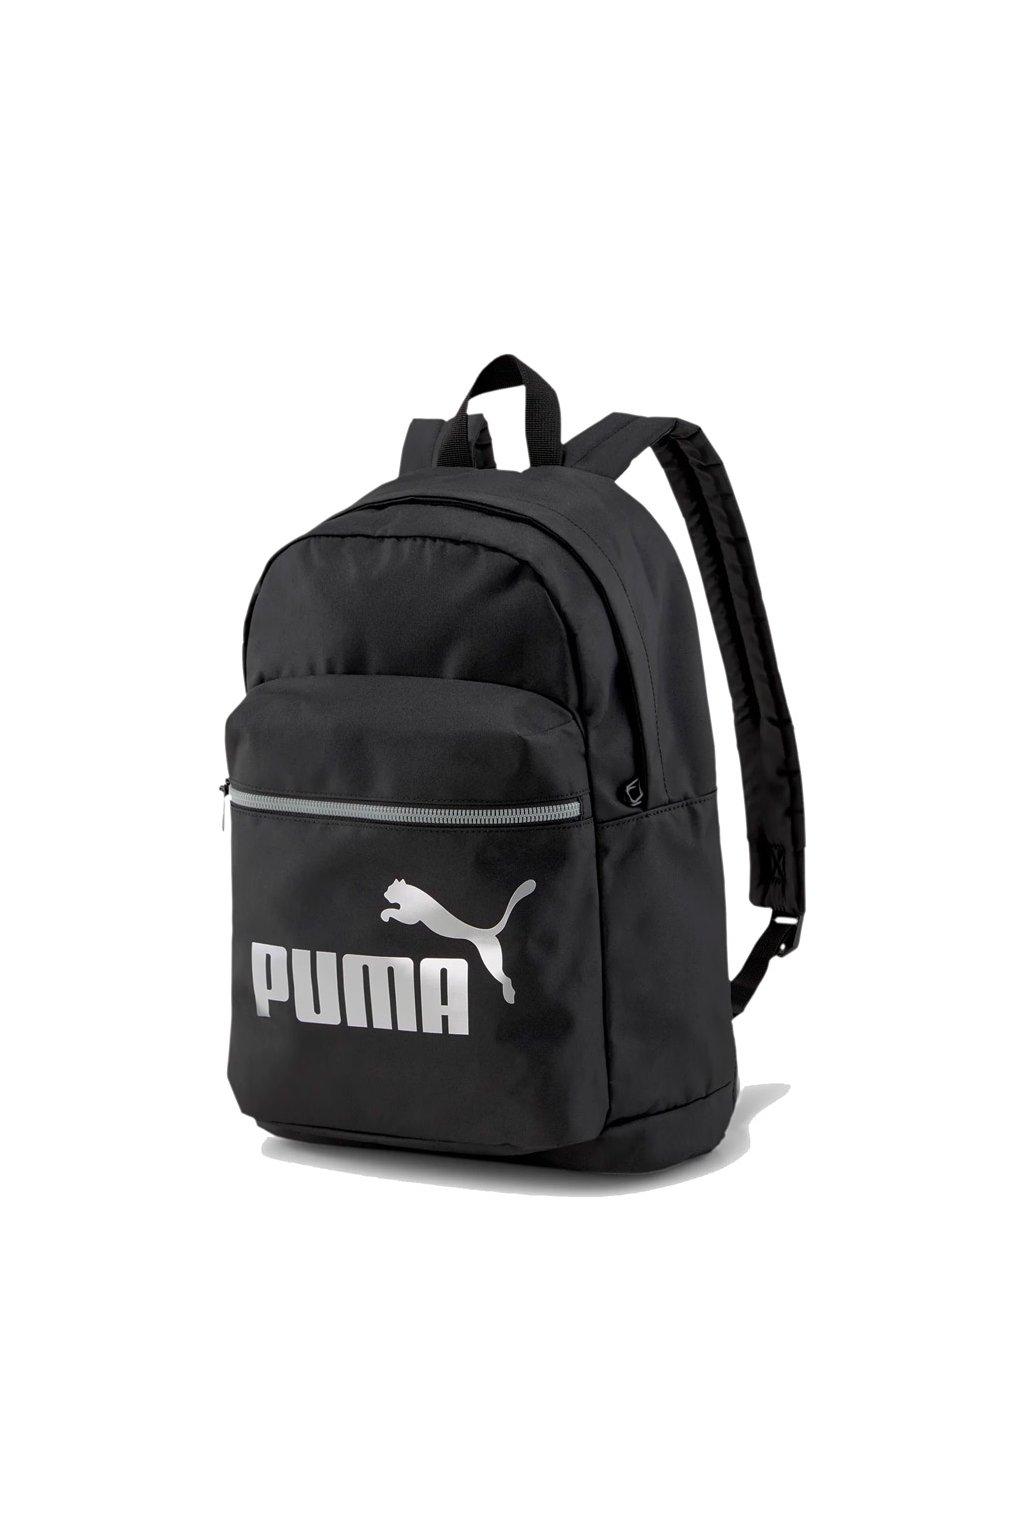 Batoh Puma WMN Core Base College Bag čierny 077374 01